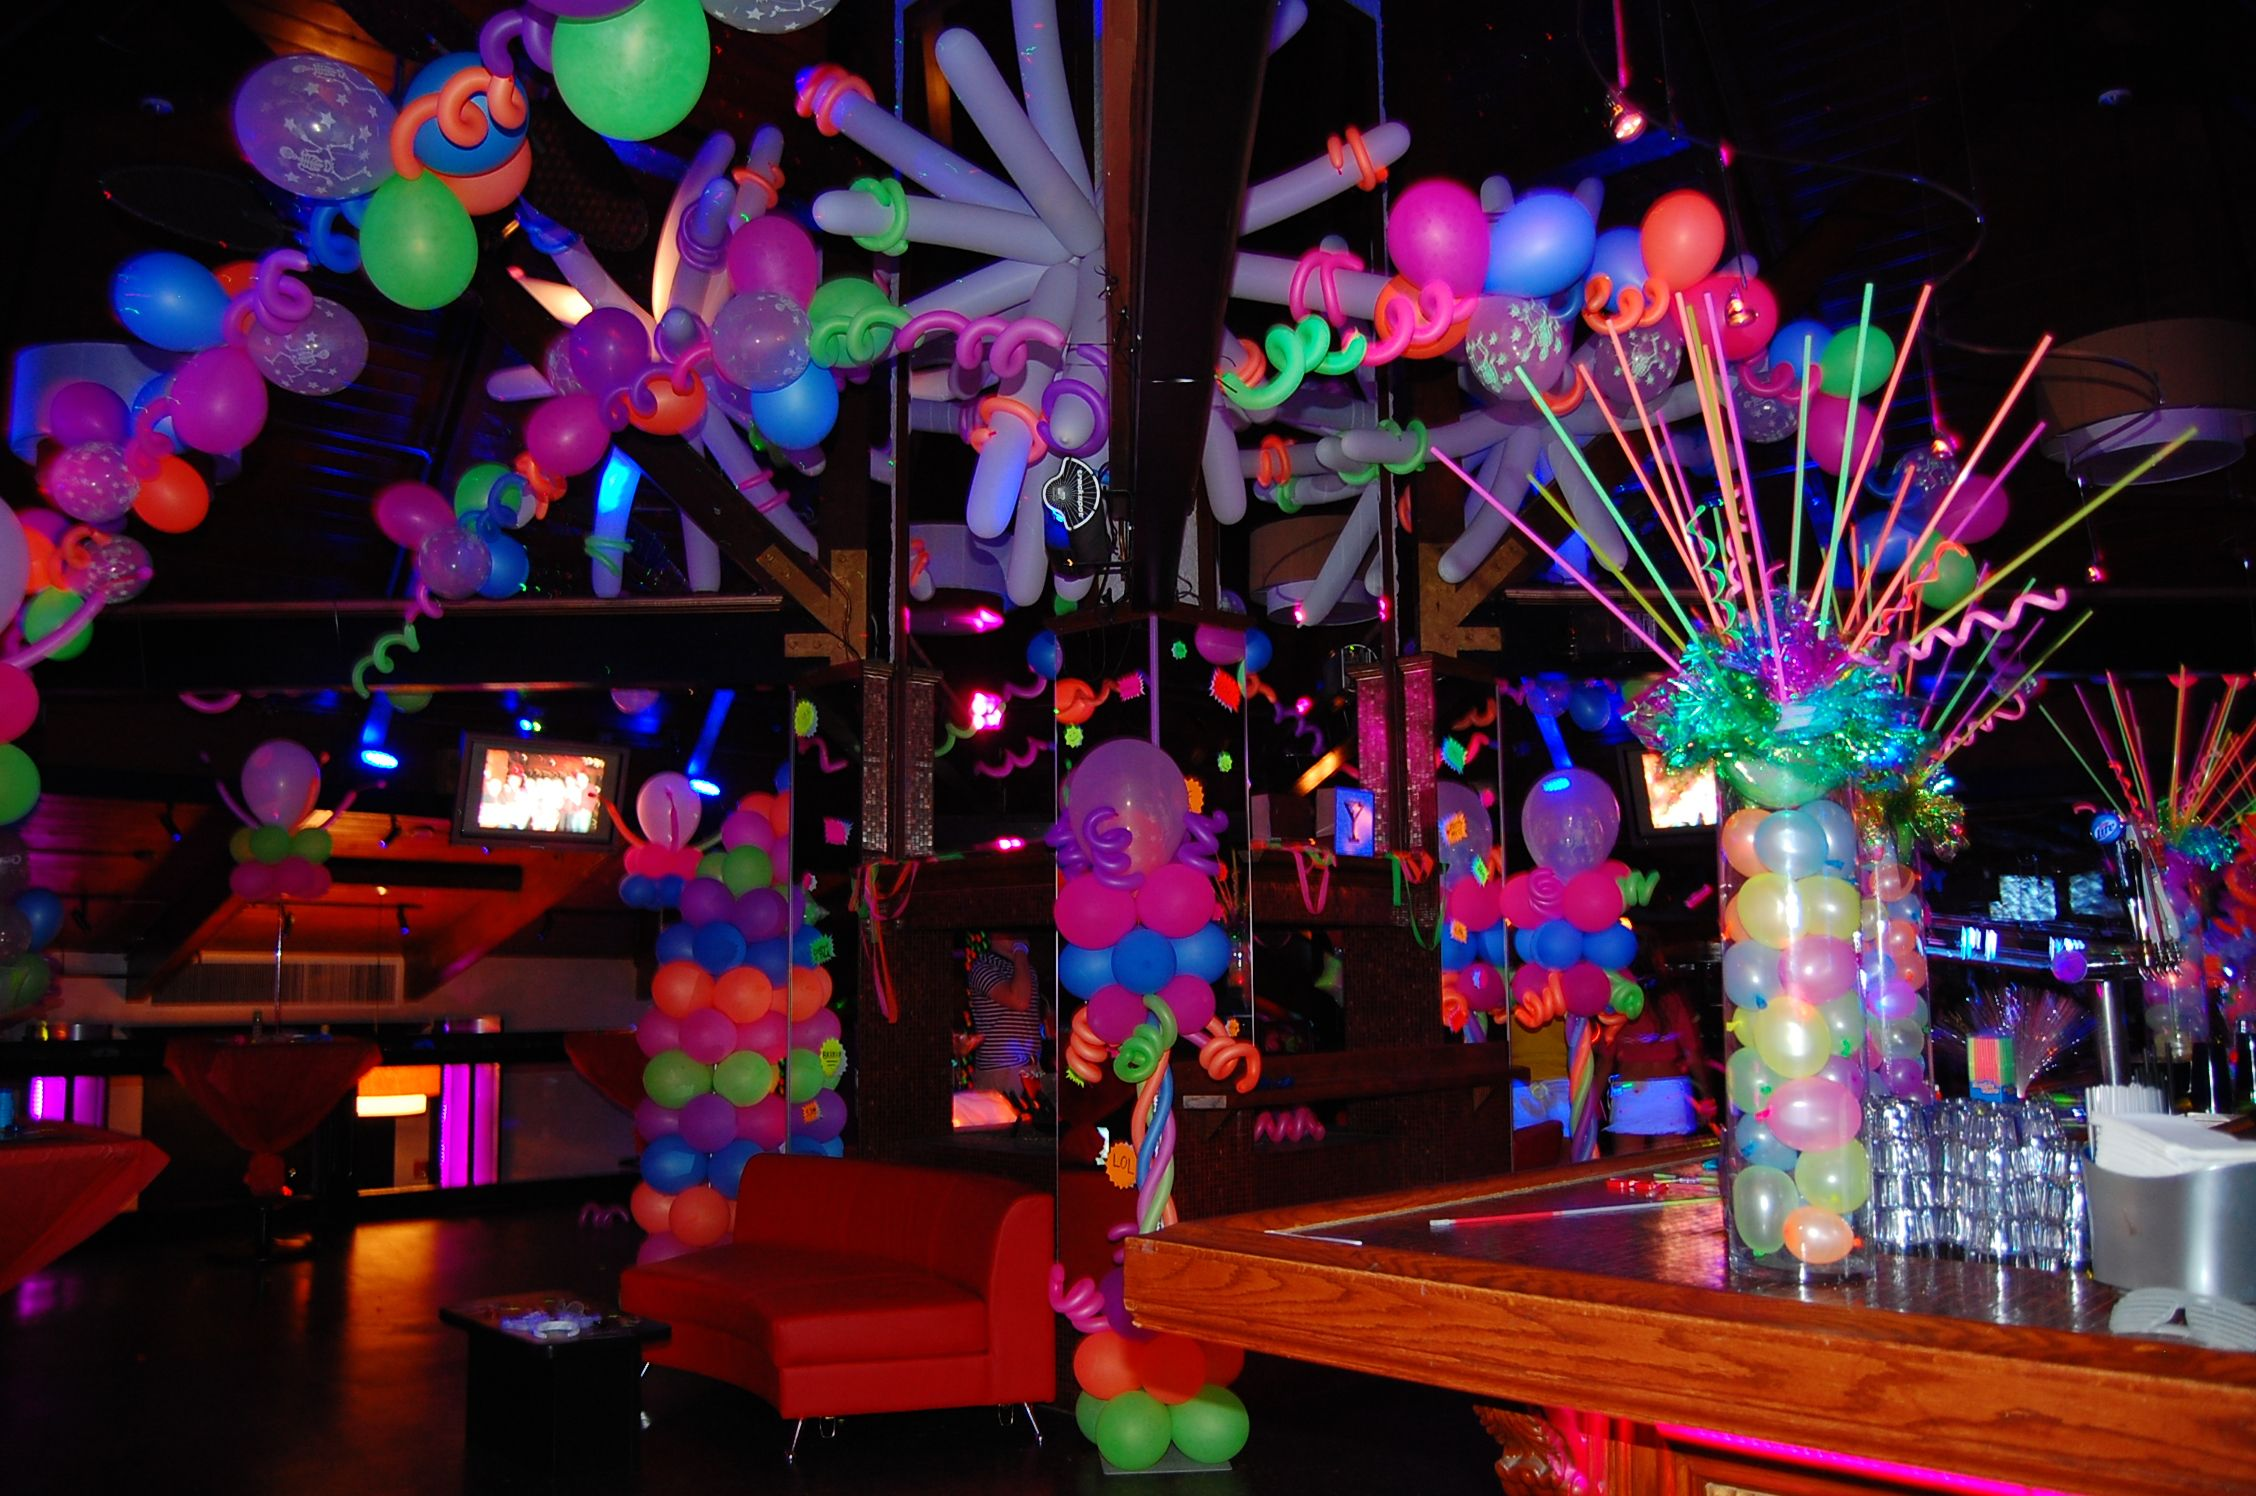 Festa De 15 Anos Ideas: Glowing Balloons! Balloonsbytommy.com